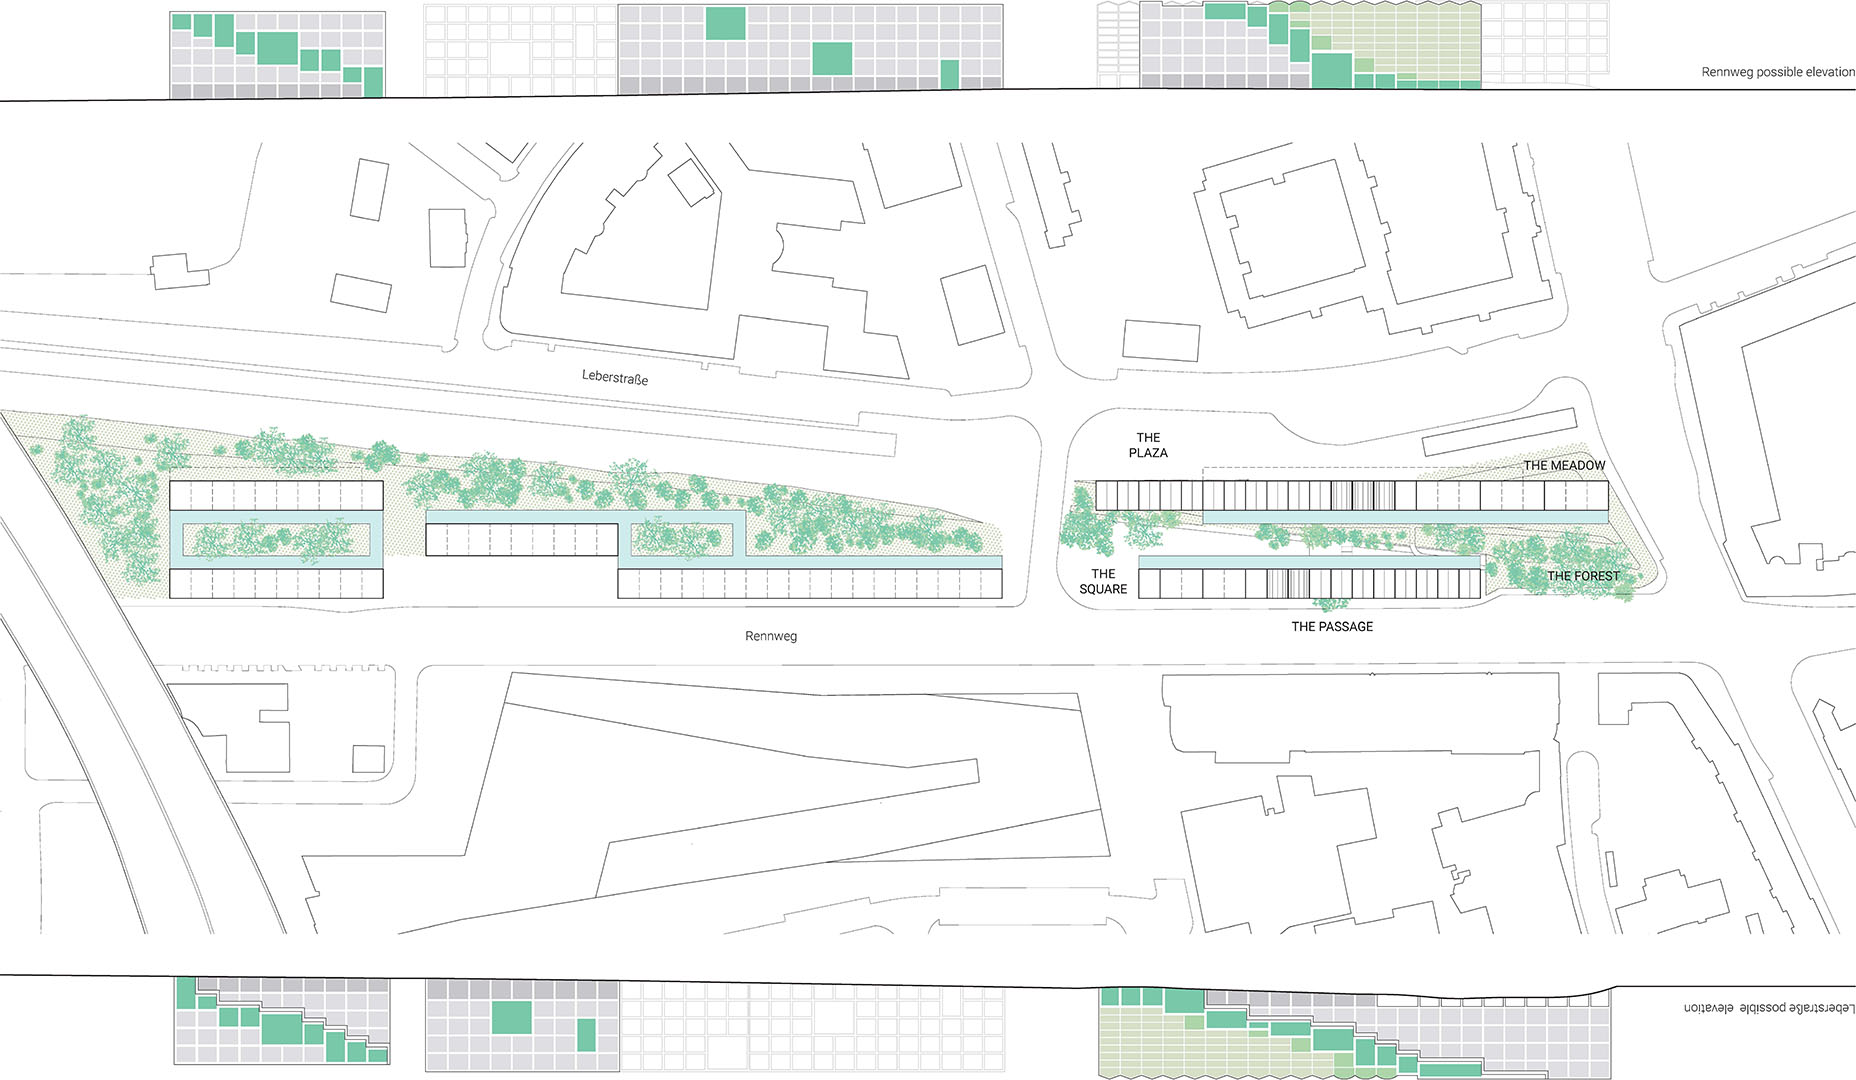 PLAYstudio_Neu Marx_Rennweg_Vienna_03_Europan 15-winner-Urban Proposal